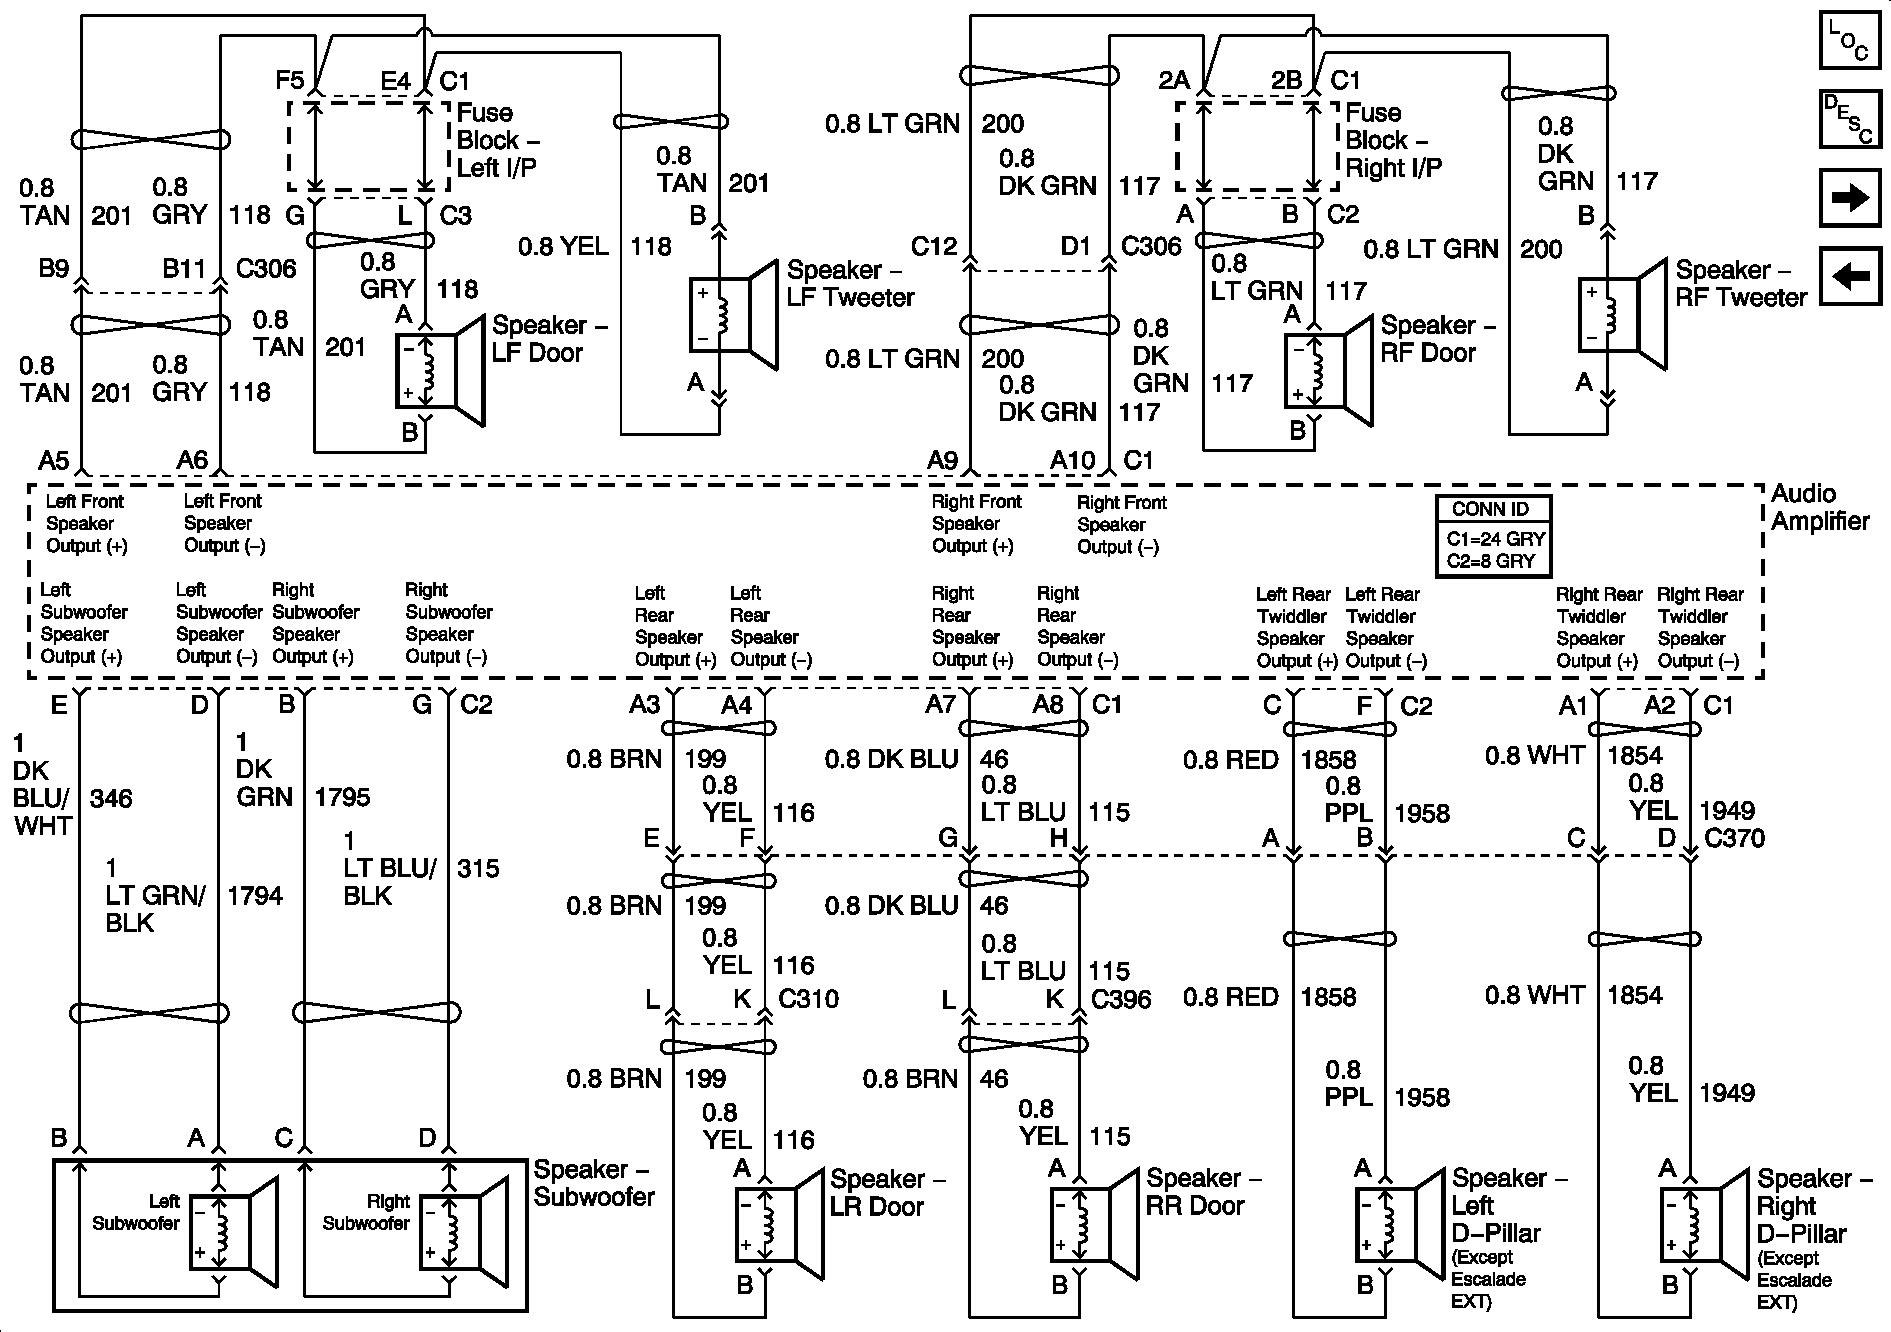 2006 cadillac bose amp wiring also bose speaker wiring diagram in